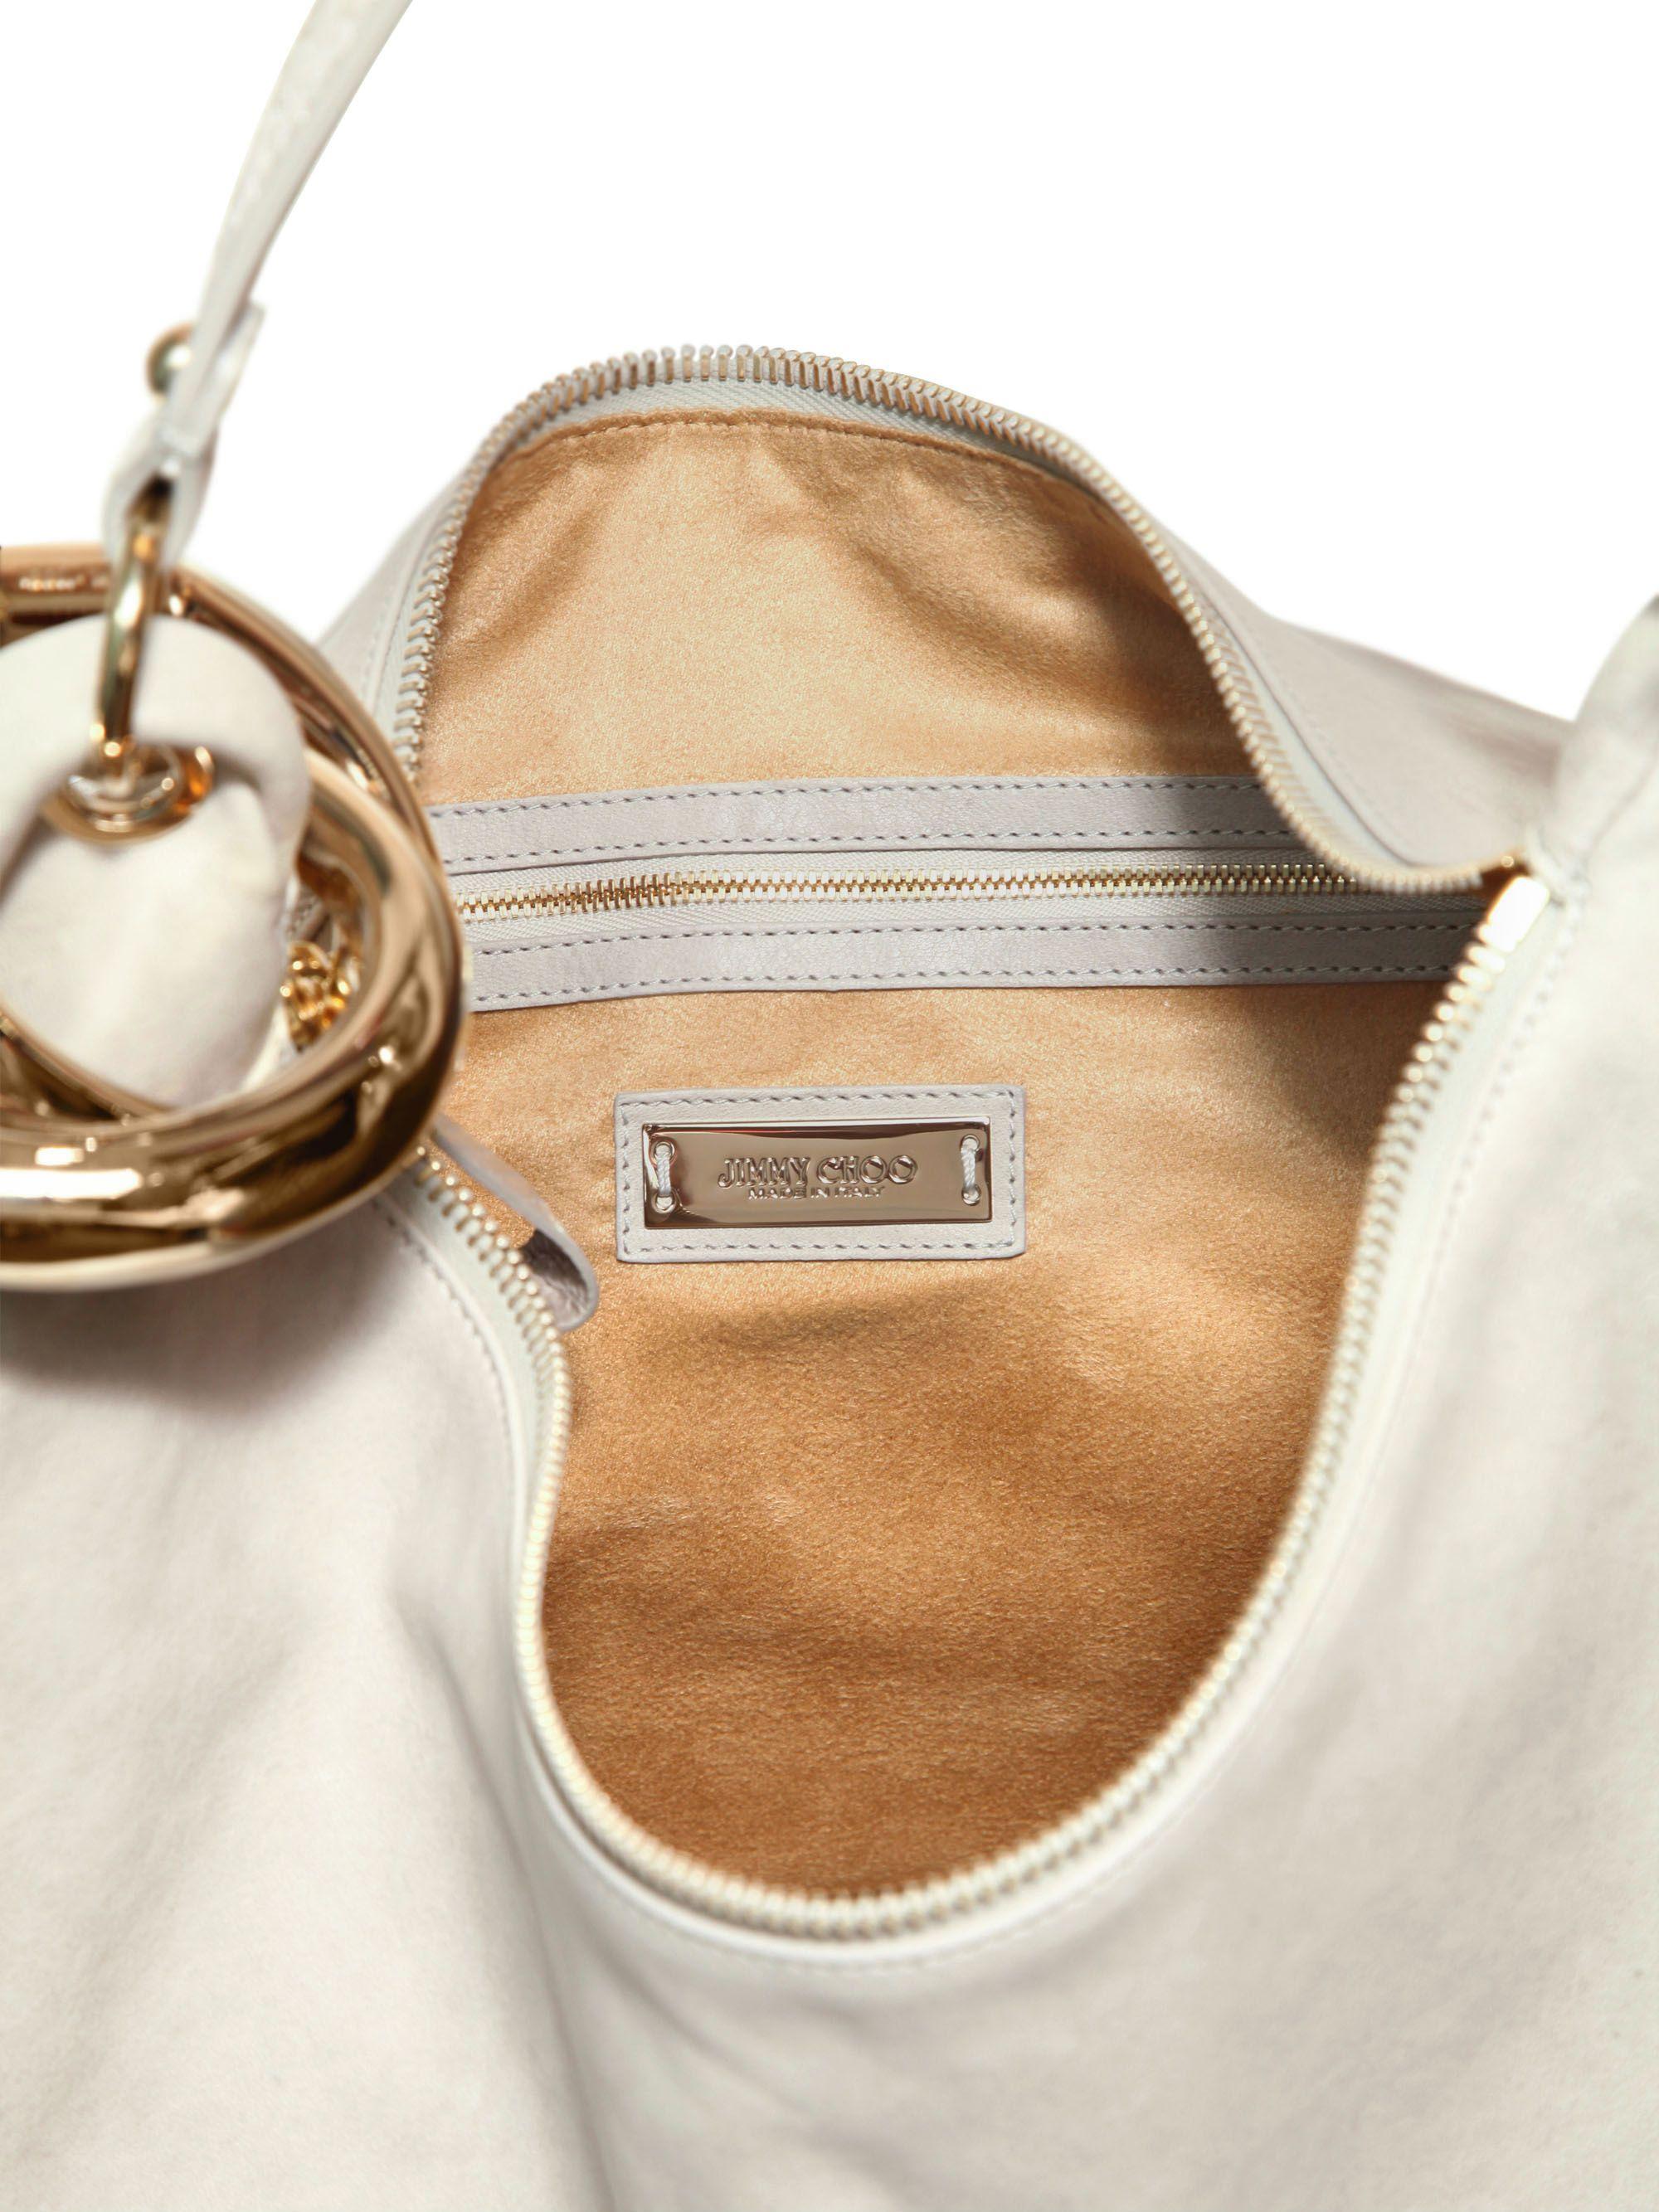 5860b4a276 Lyst - Jimmy Choo Large Solar Soft Leather Shoulder Bag in Gray